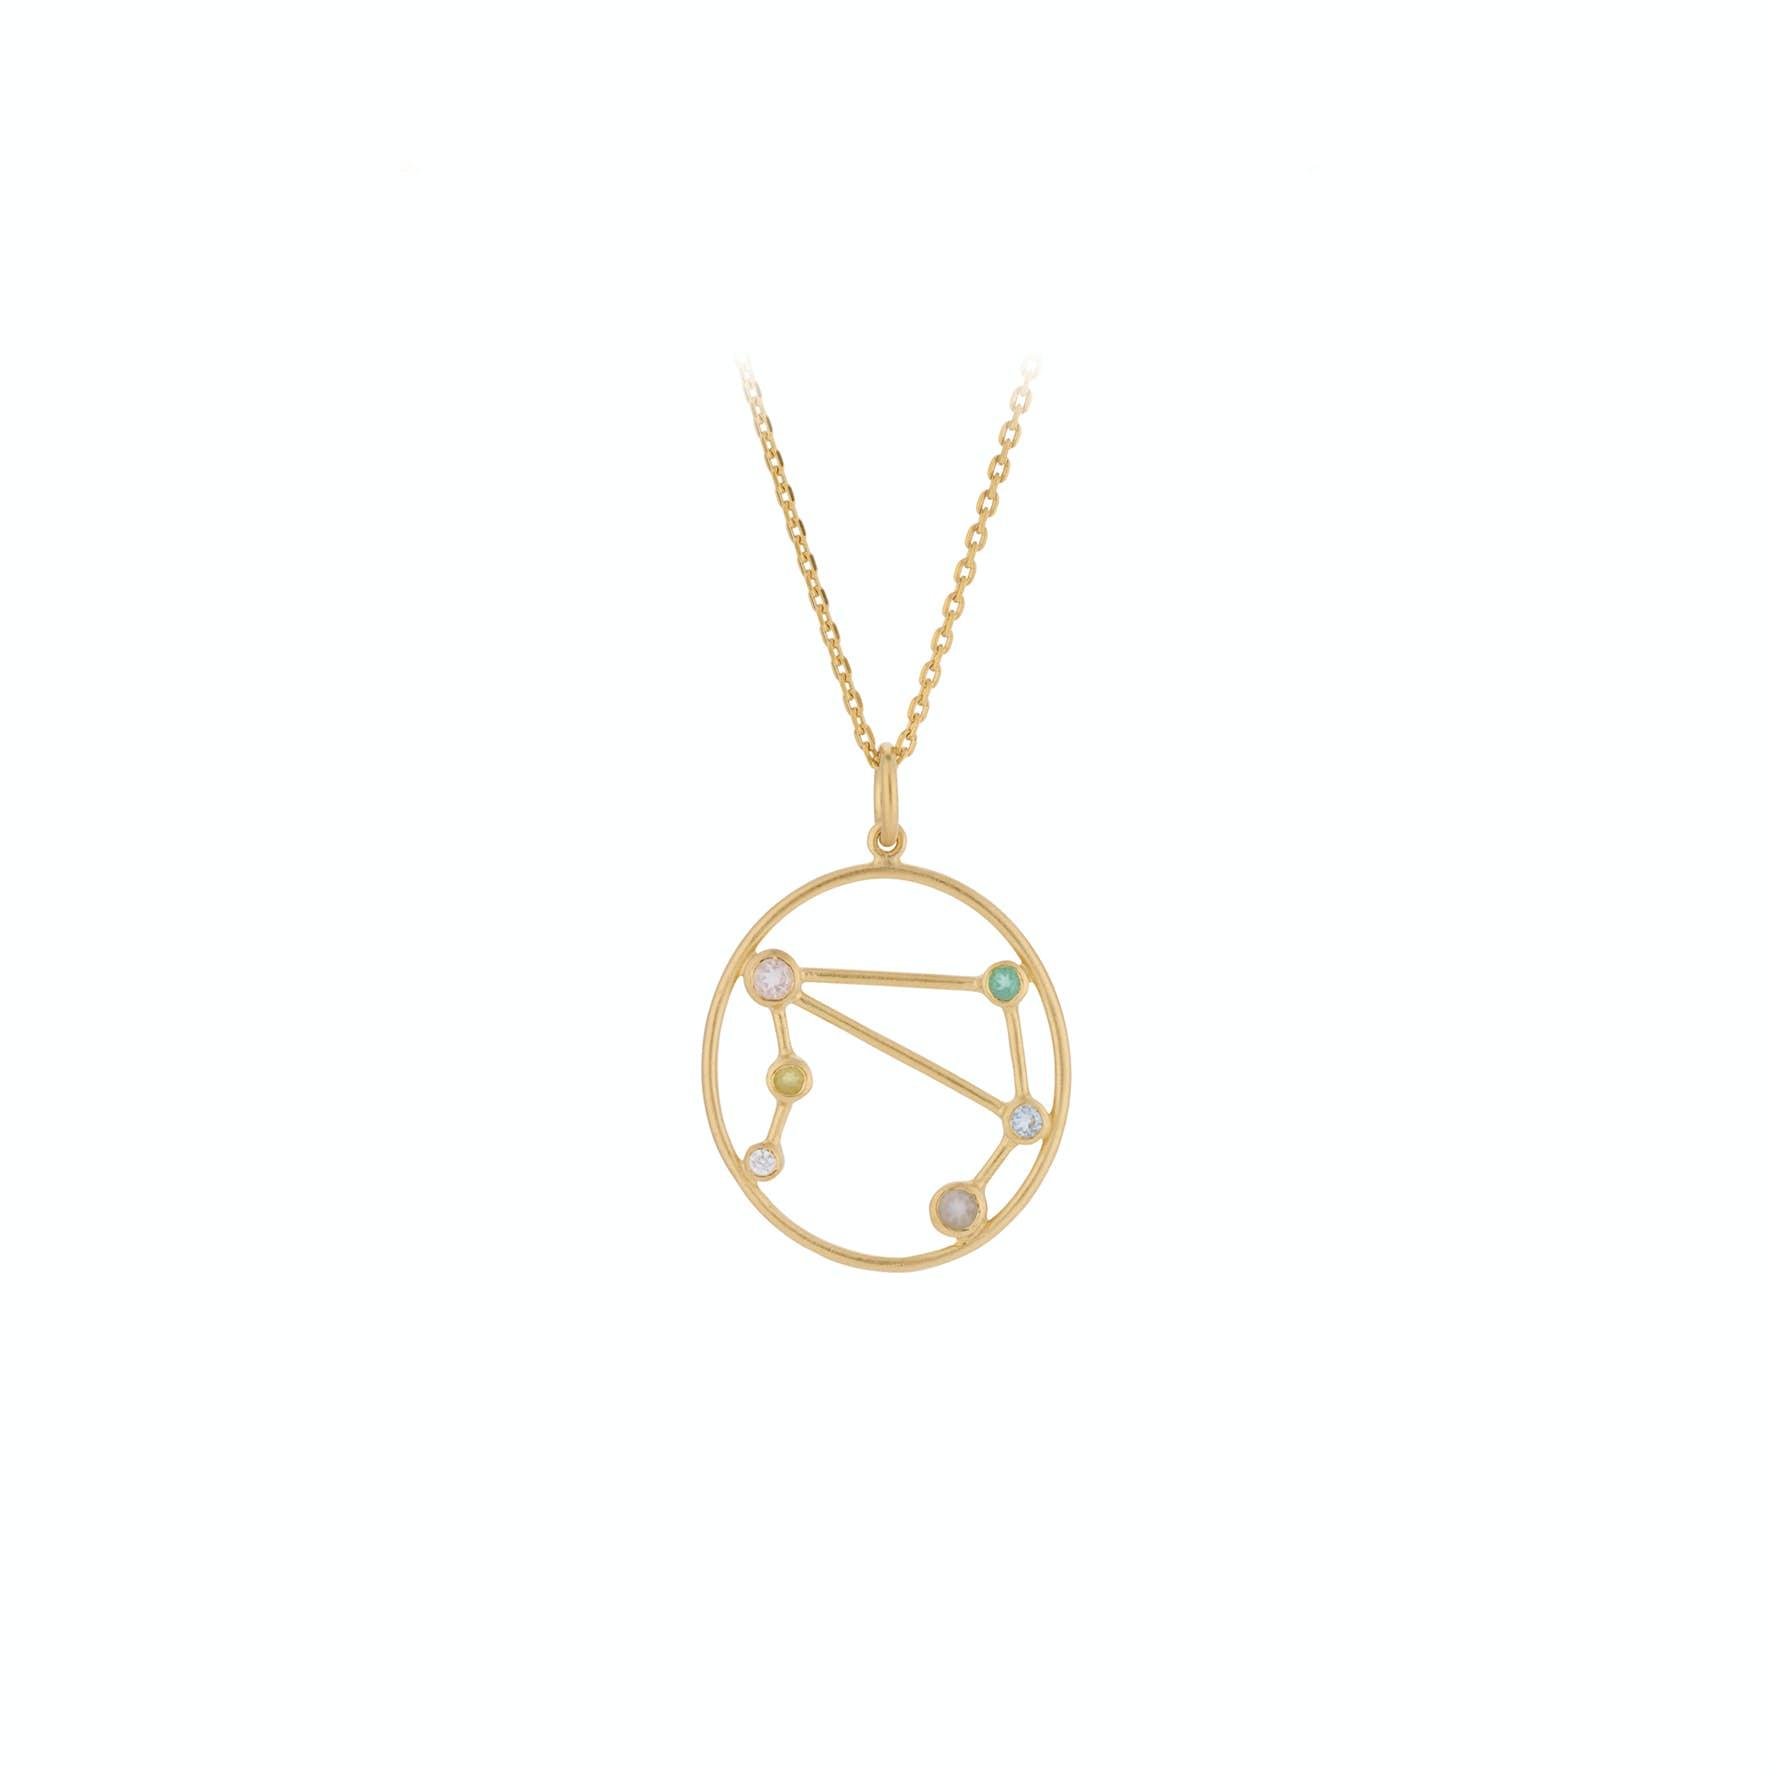 Zodiac Libra Necklace (Sep 23 - Oct 22) von Pernille Corydon in Vergoldet-Silber Sterling 925